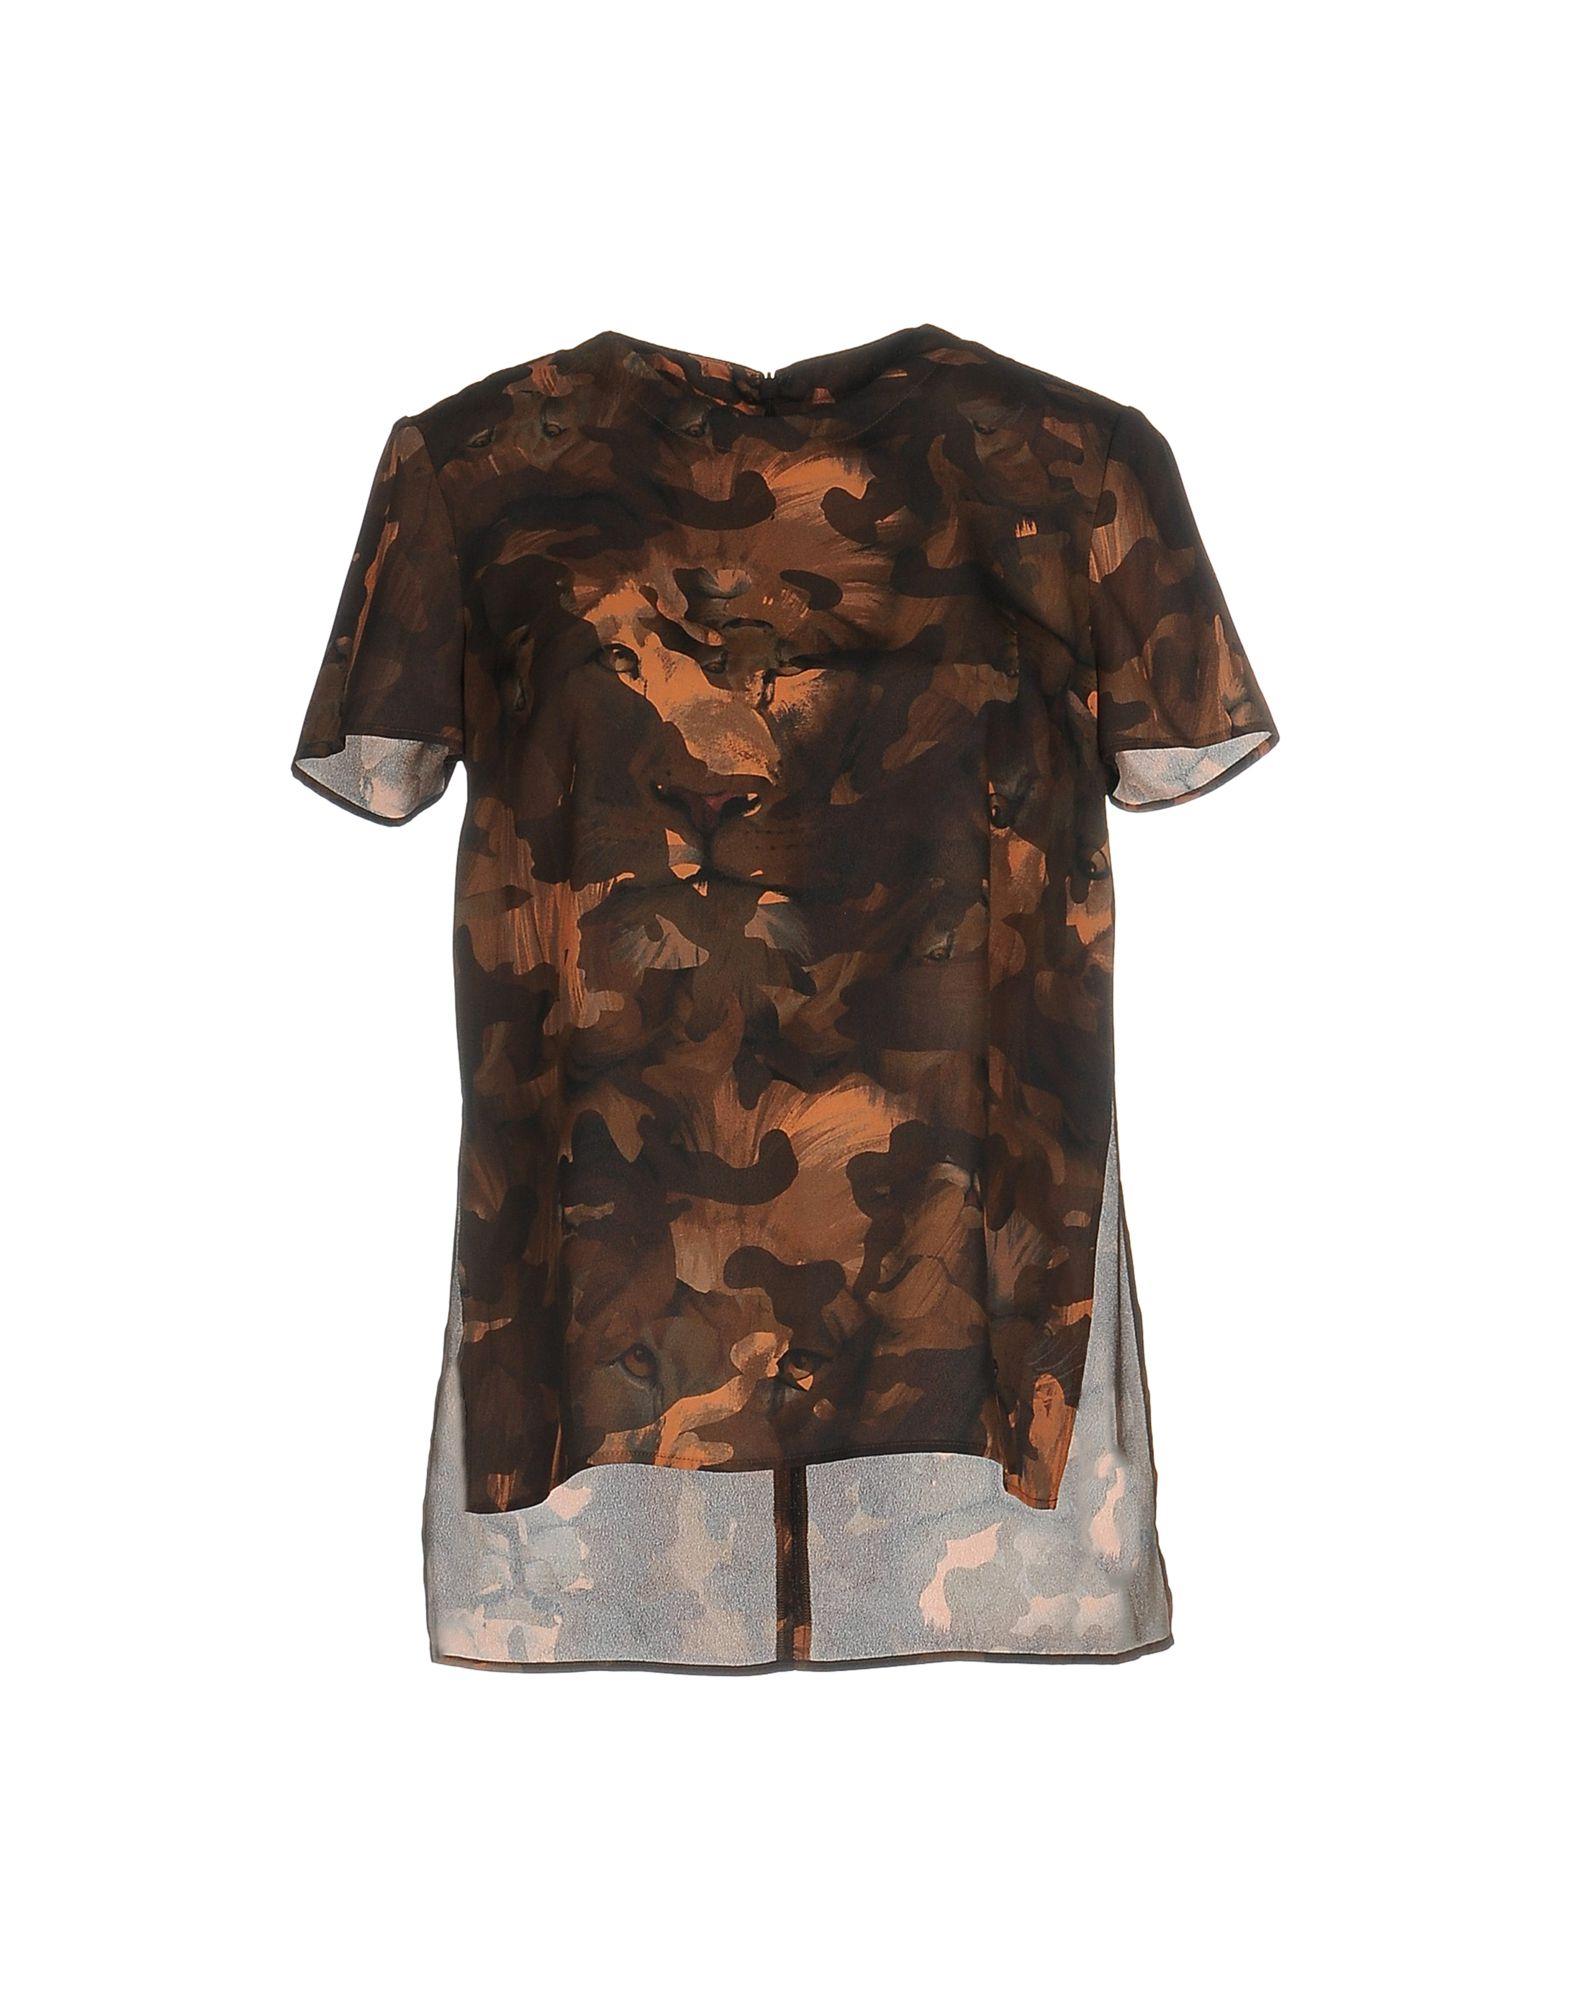 VERSUS VERSACE Блузка блузка с рисунком короткие рукава вырез сзади